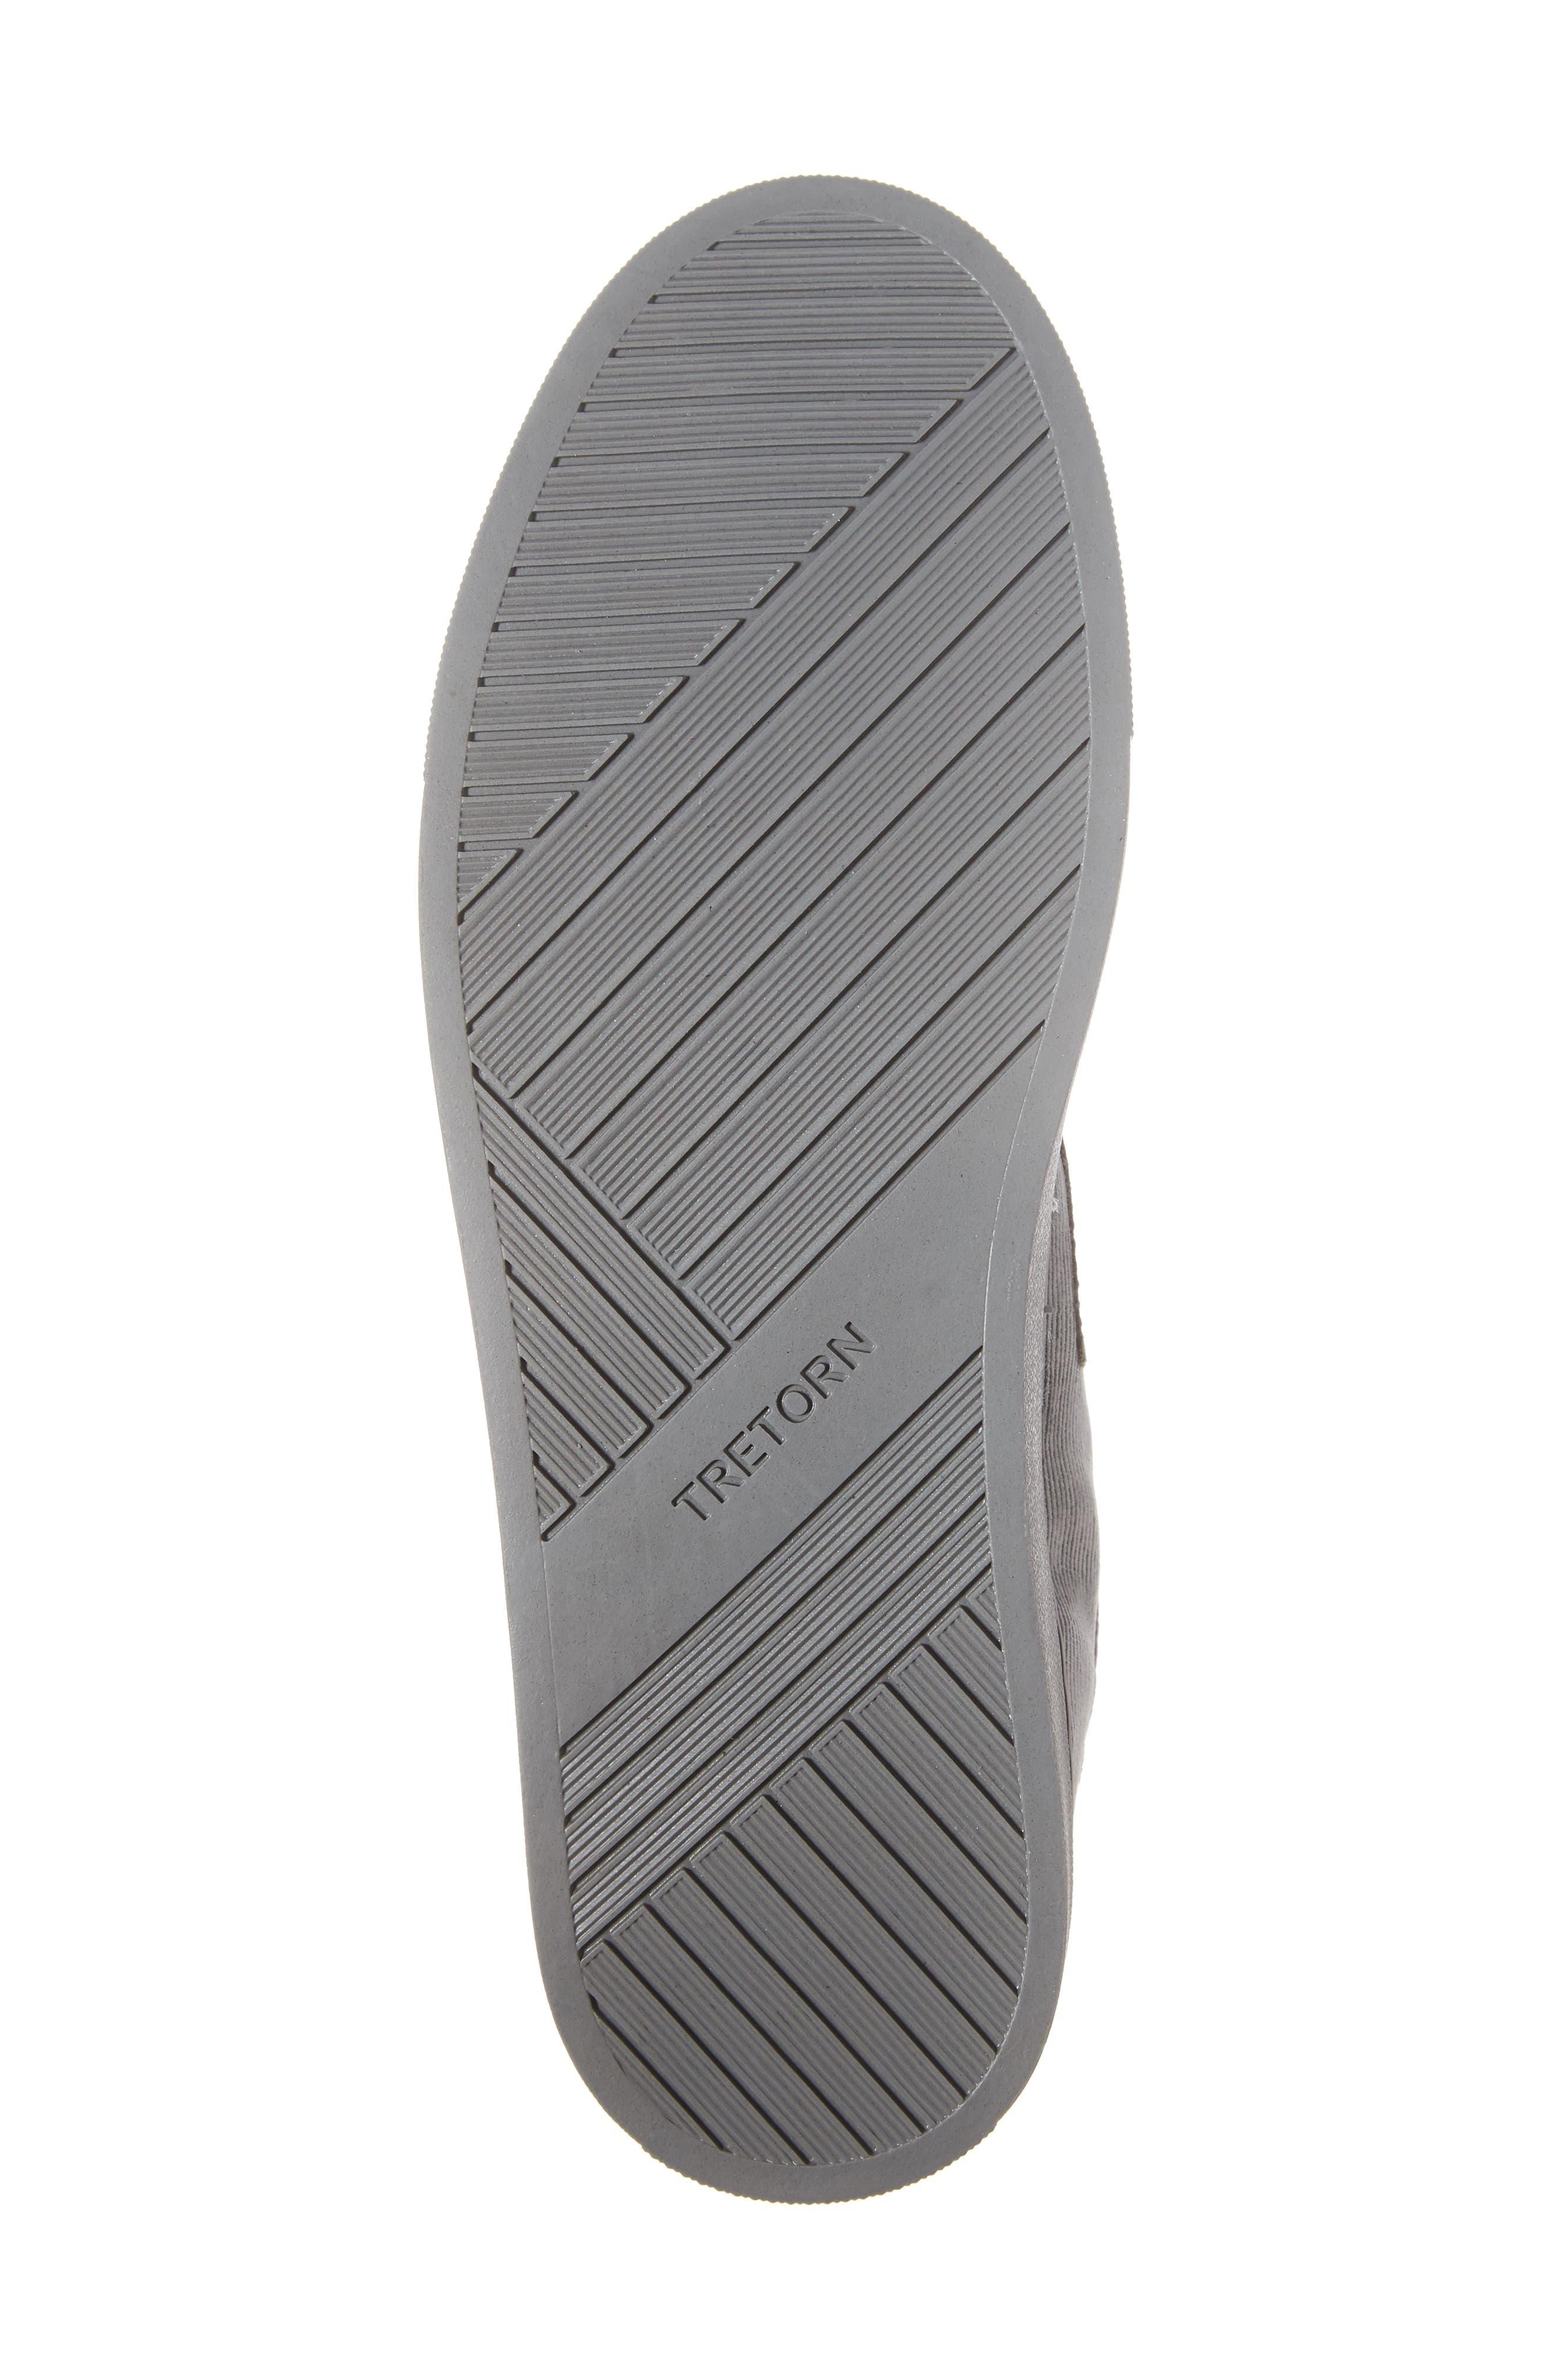 Jack High Top Sneaker,                             Alternate thumbnail 6, color,                             Grey/ Grey